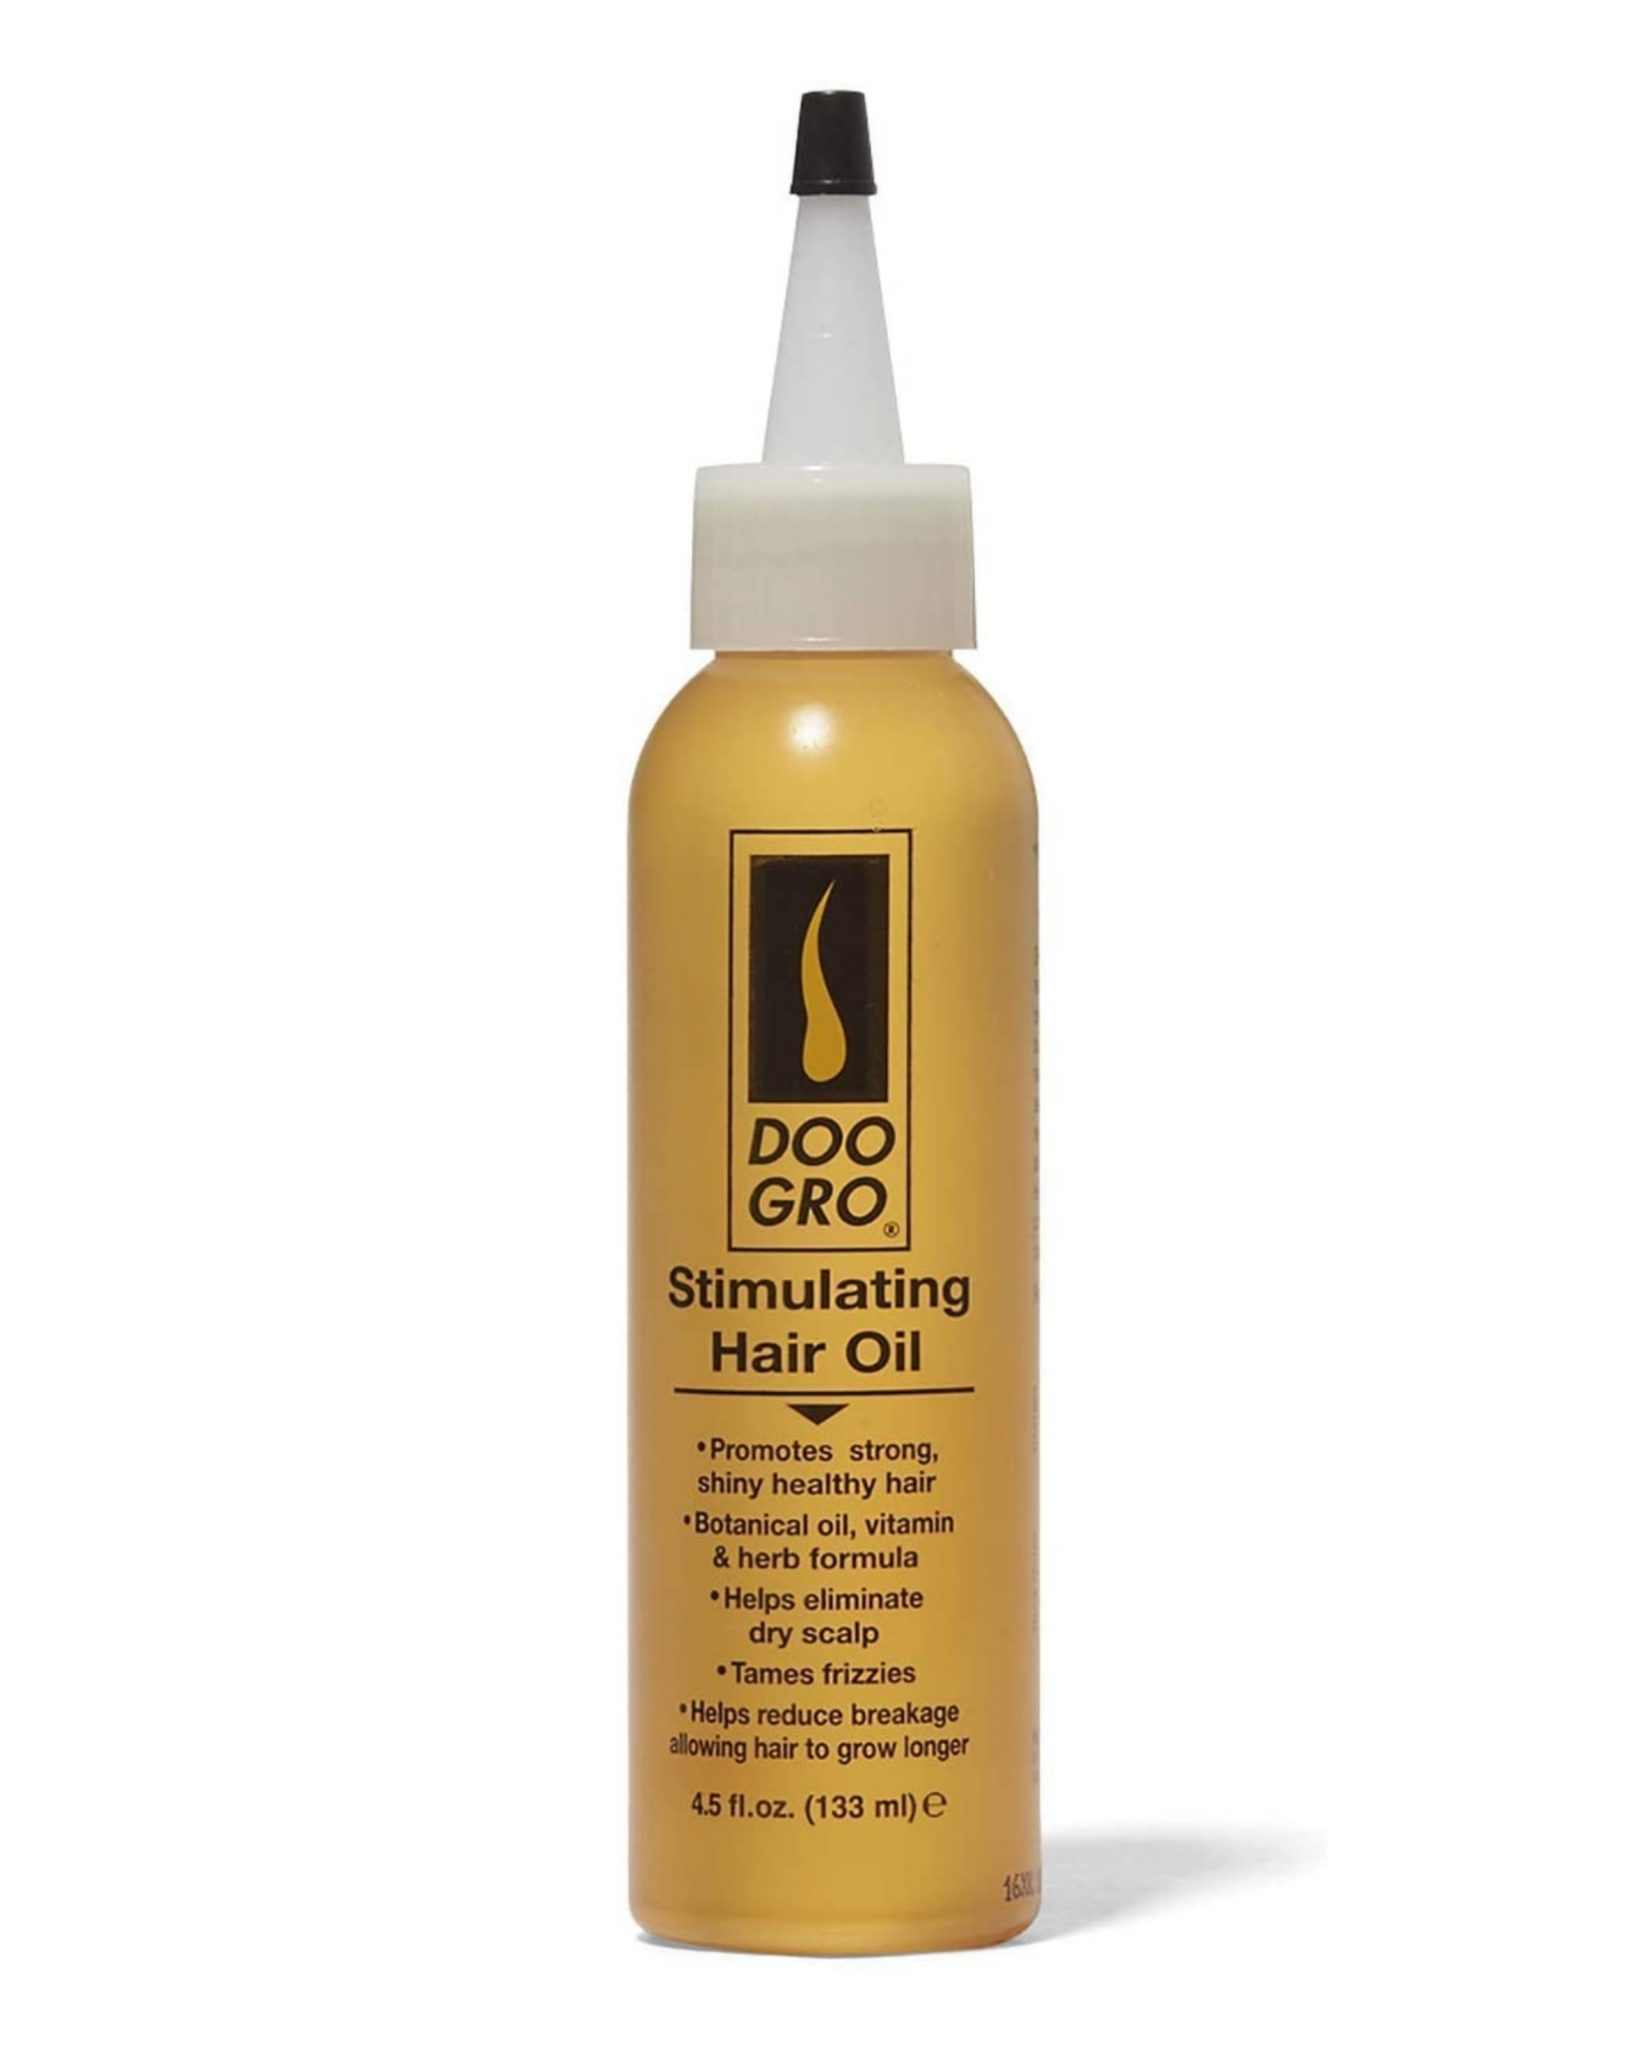 Doo Gro Stimulating Hair Oil 4.5Oz